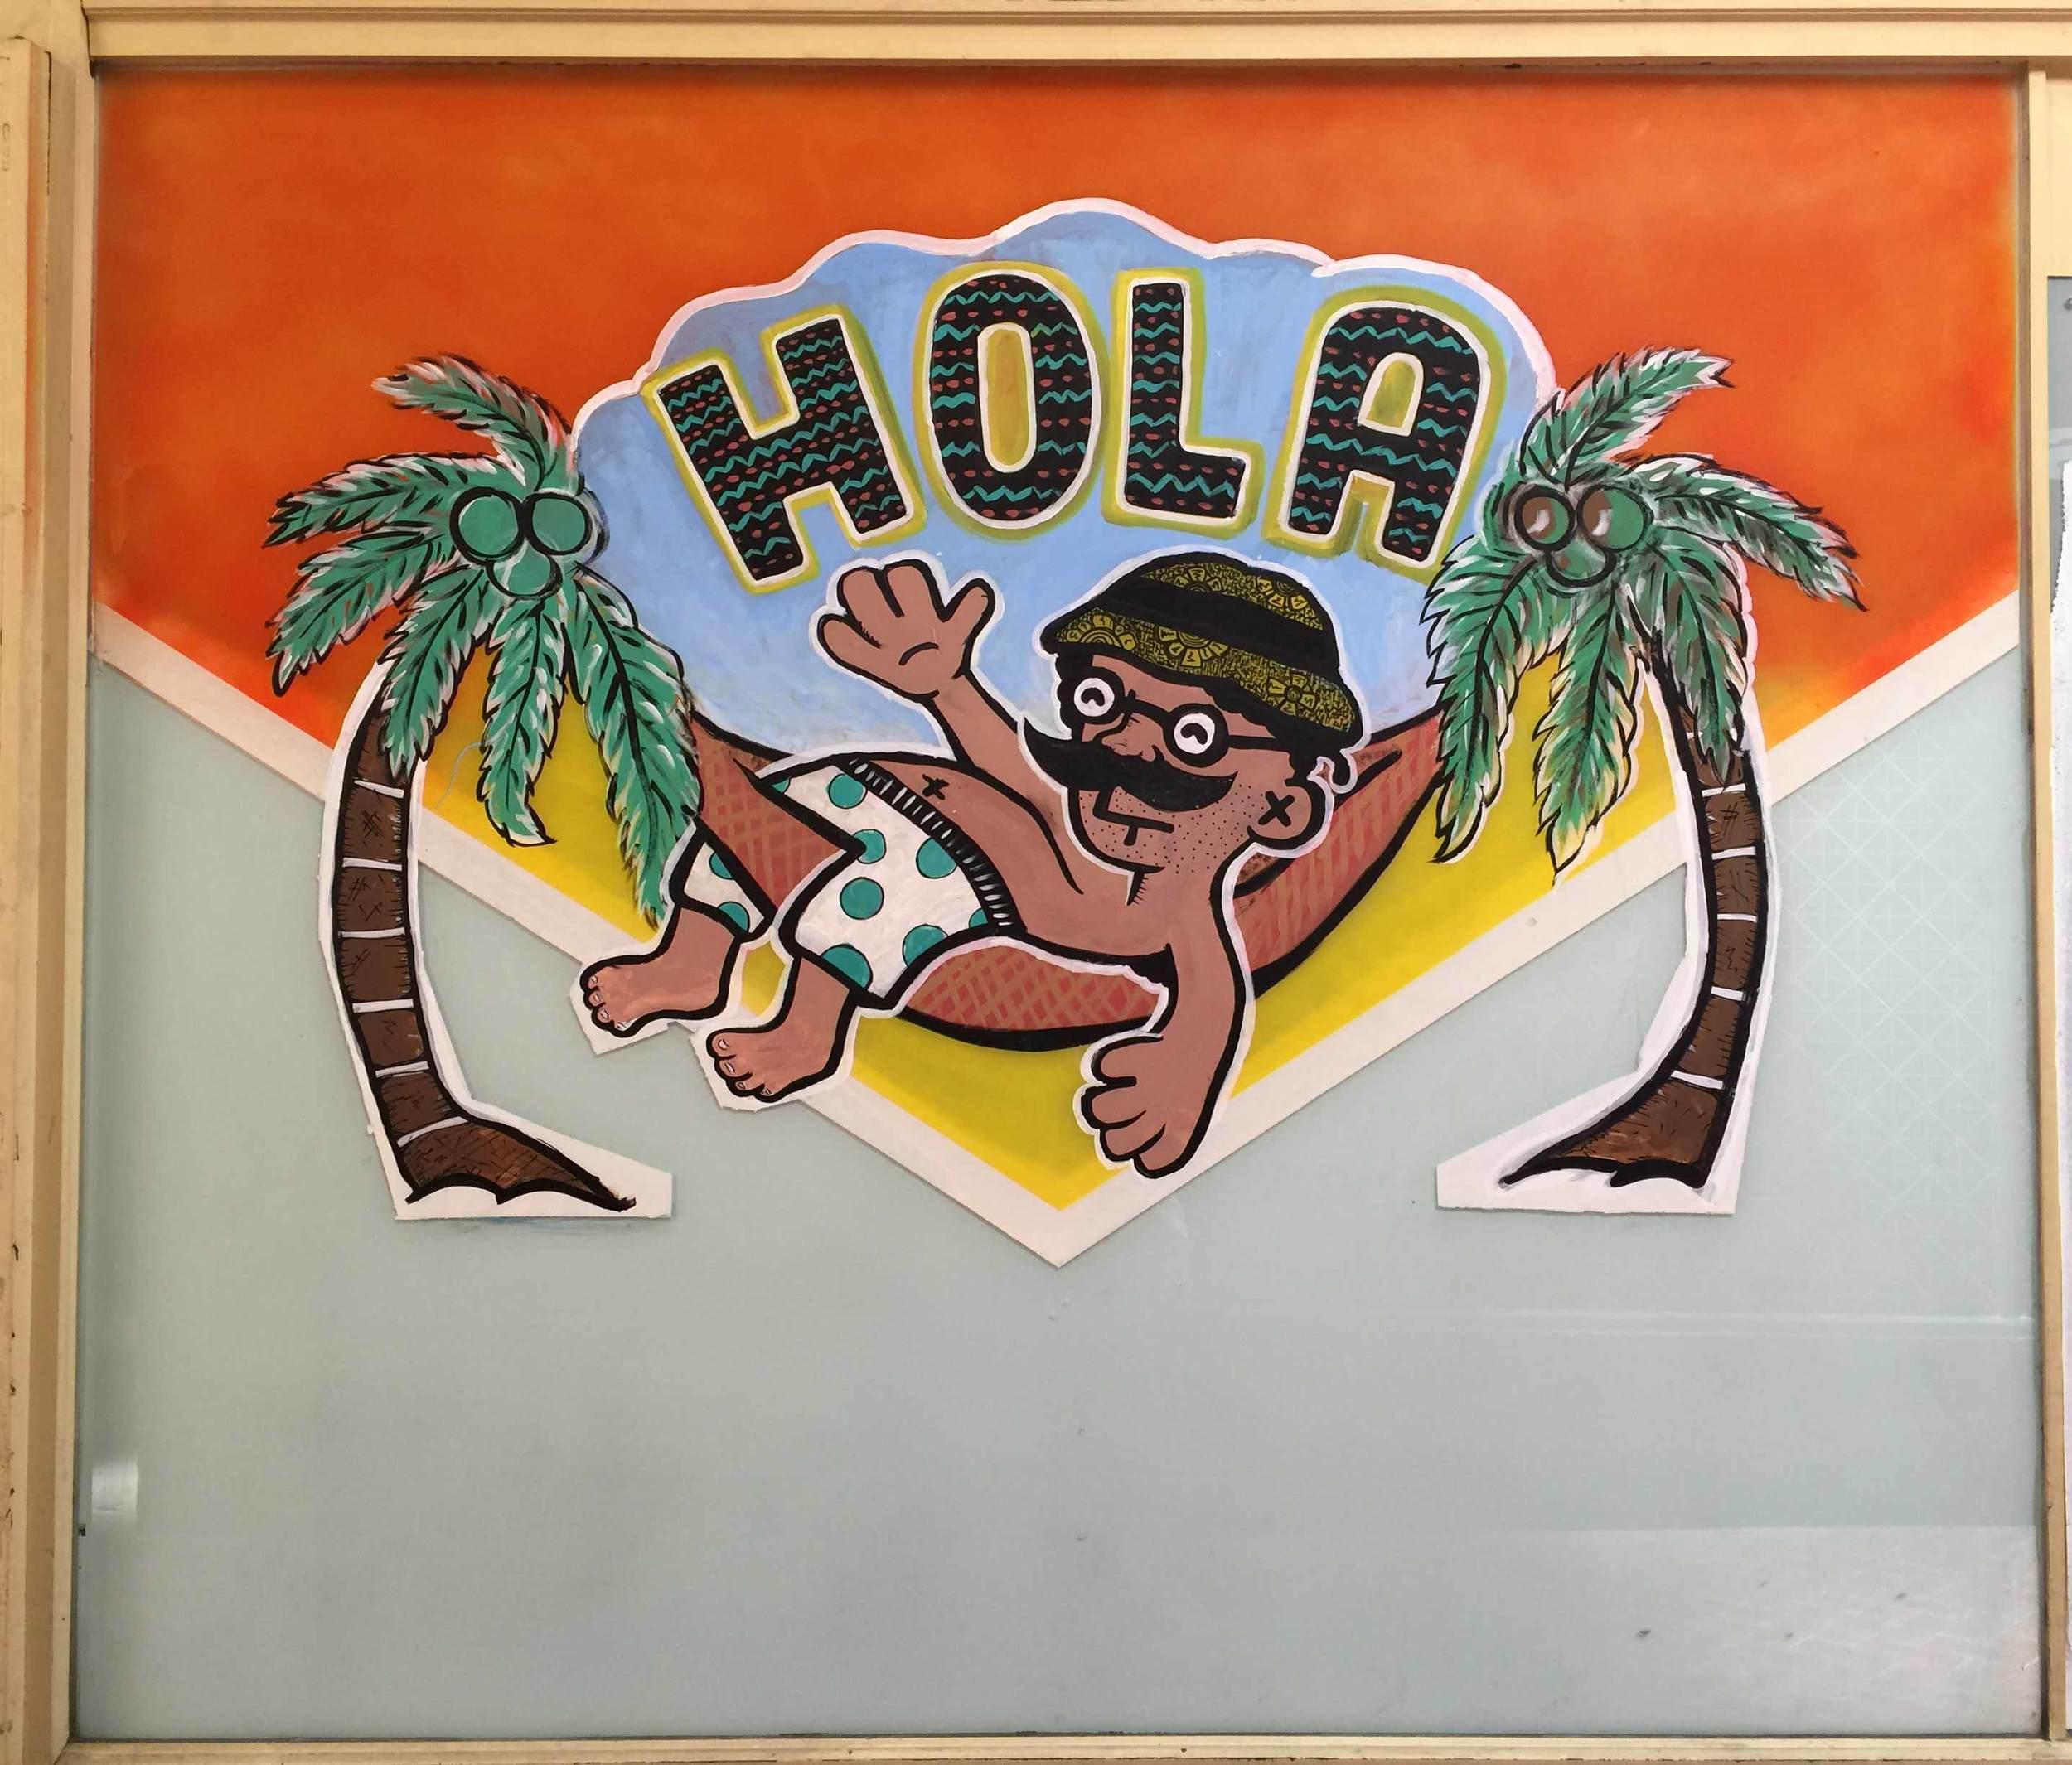 toli-hola-spainish-art-street-art-mural